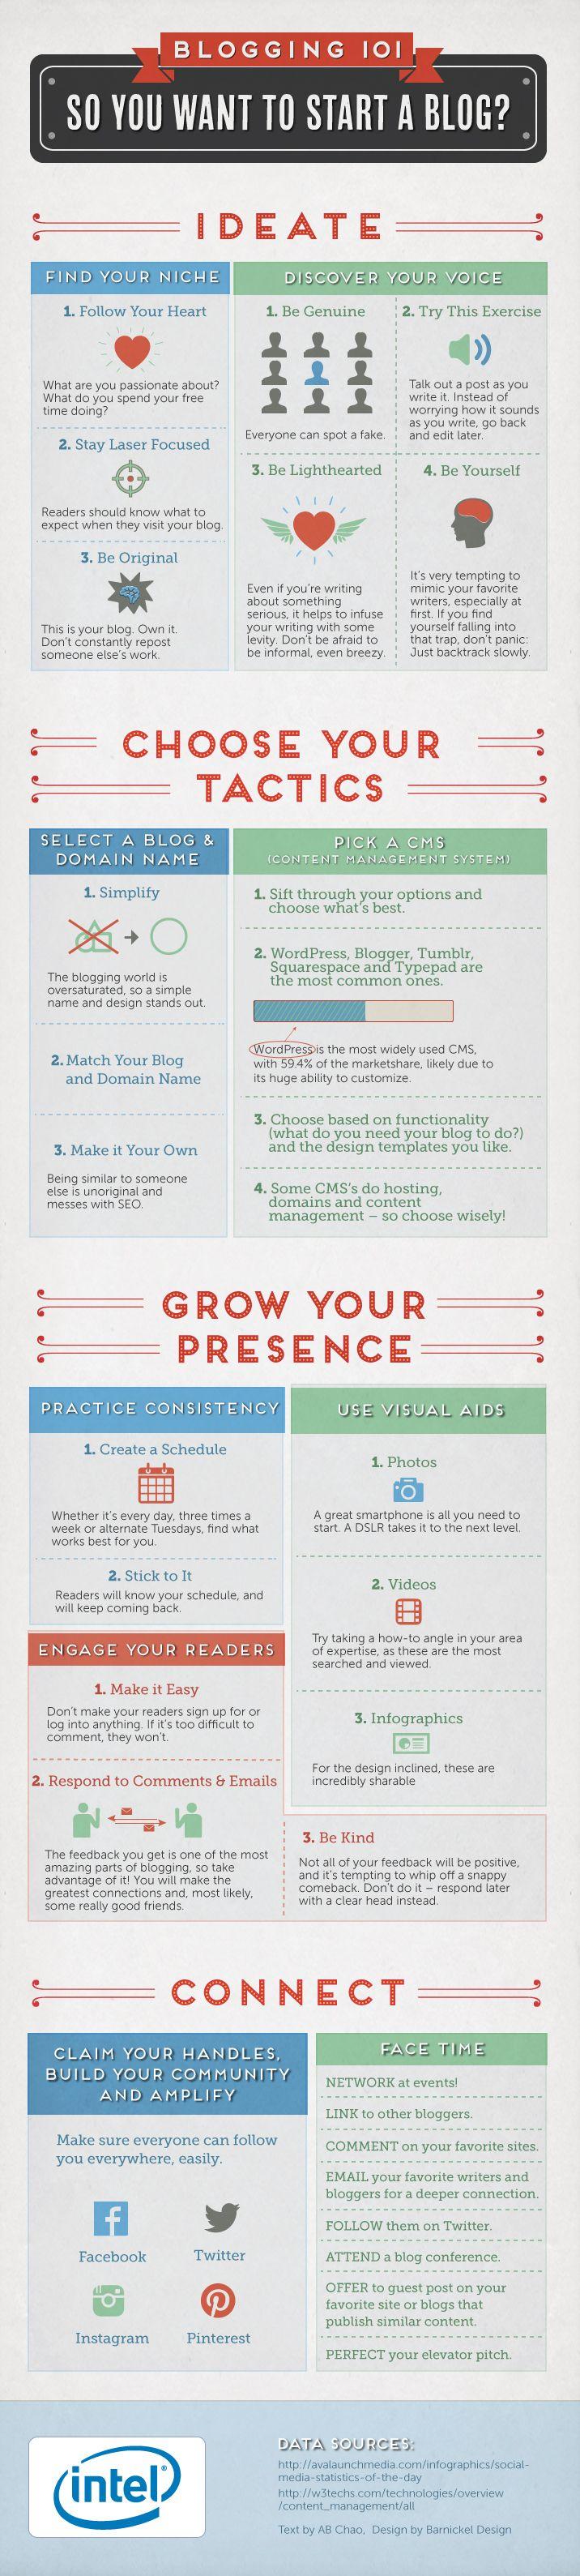 123 best Blogging & Content Marketing images on Pinterest